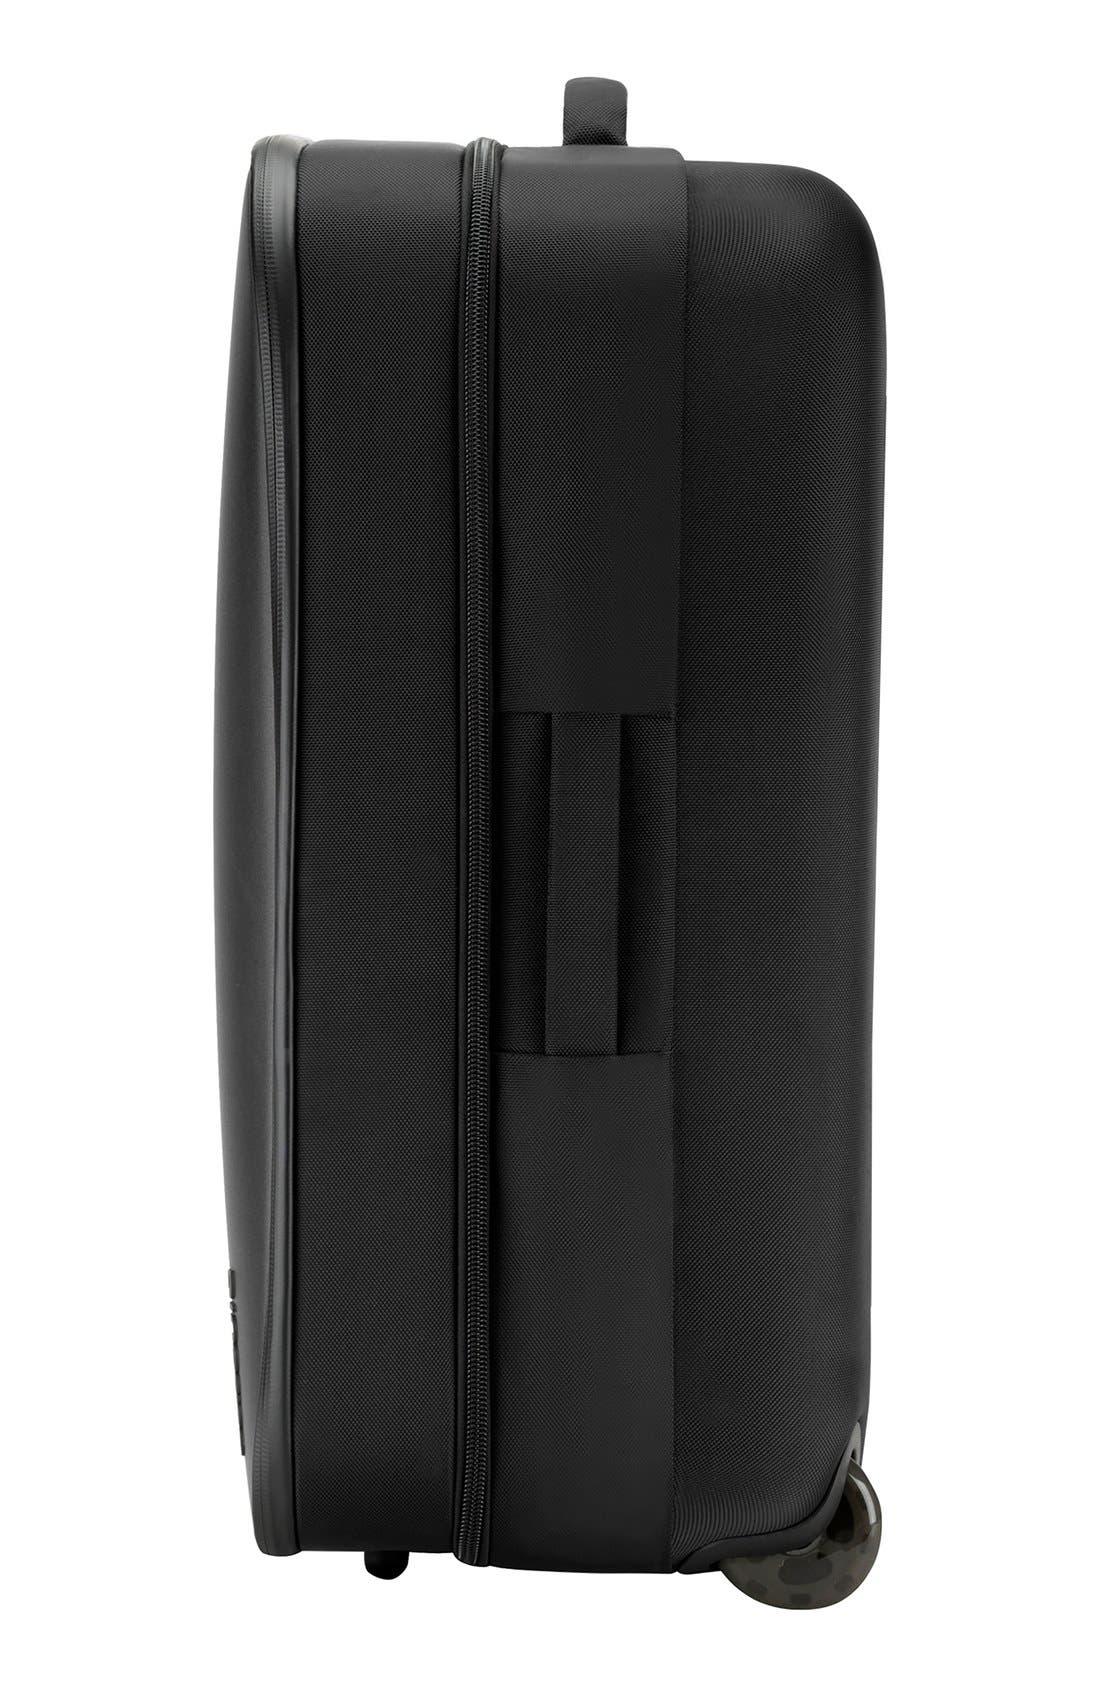 VIA 34 Inch Wheeled Suitcase,                             Alternate thumbnail 2, color,                             001